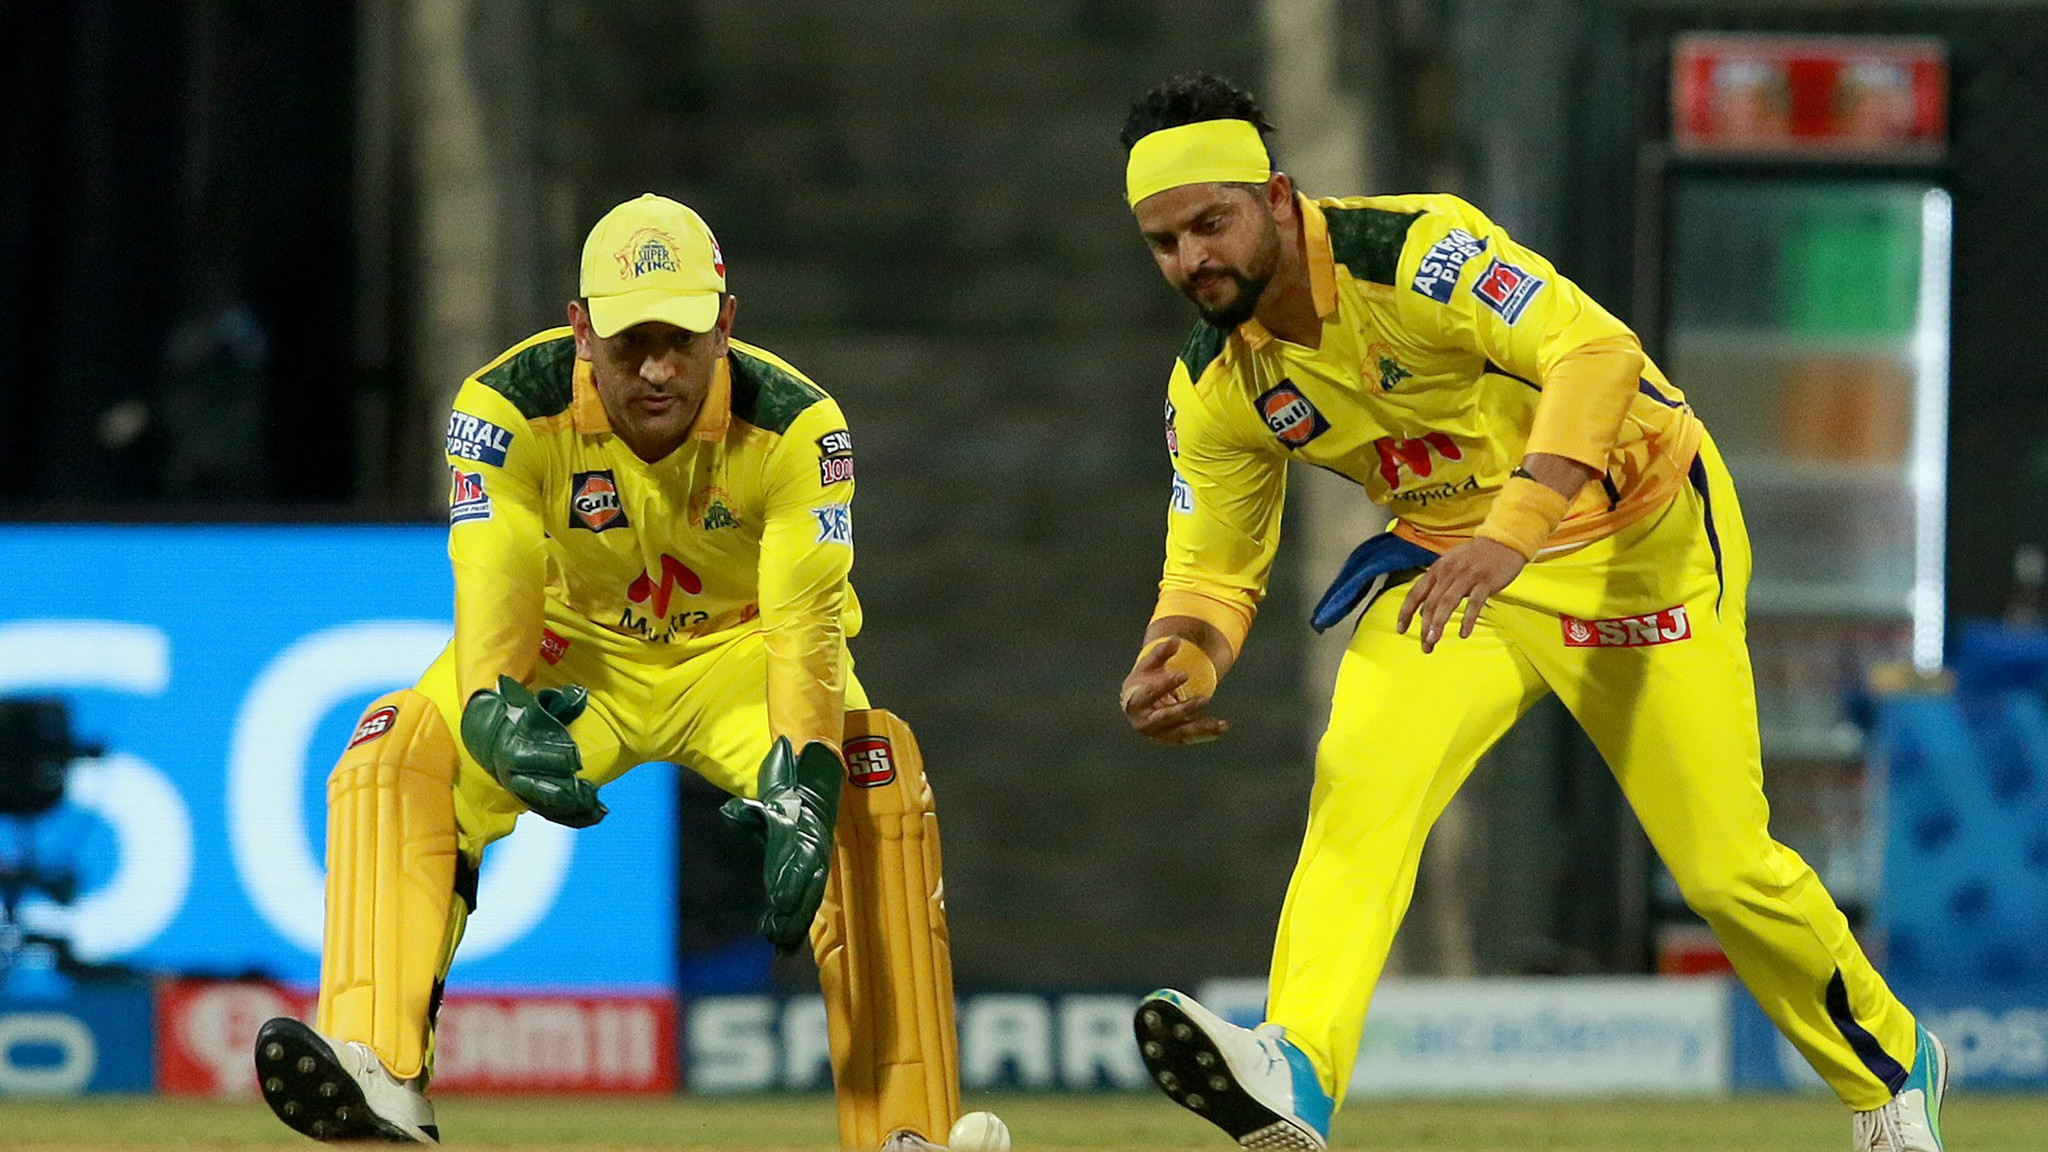 IPL 2021: Keep inspiring us, Thala - Suresh Raina lauds MS Dhoni for completing 150 IPL dismissals